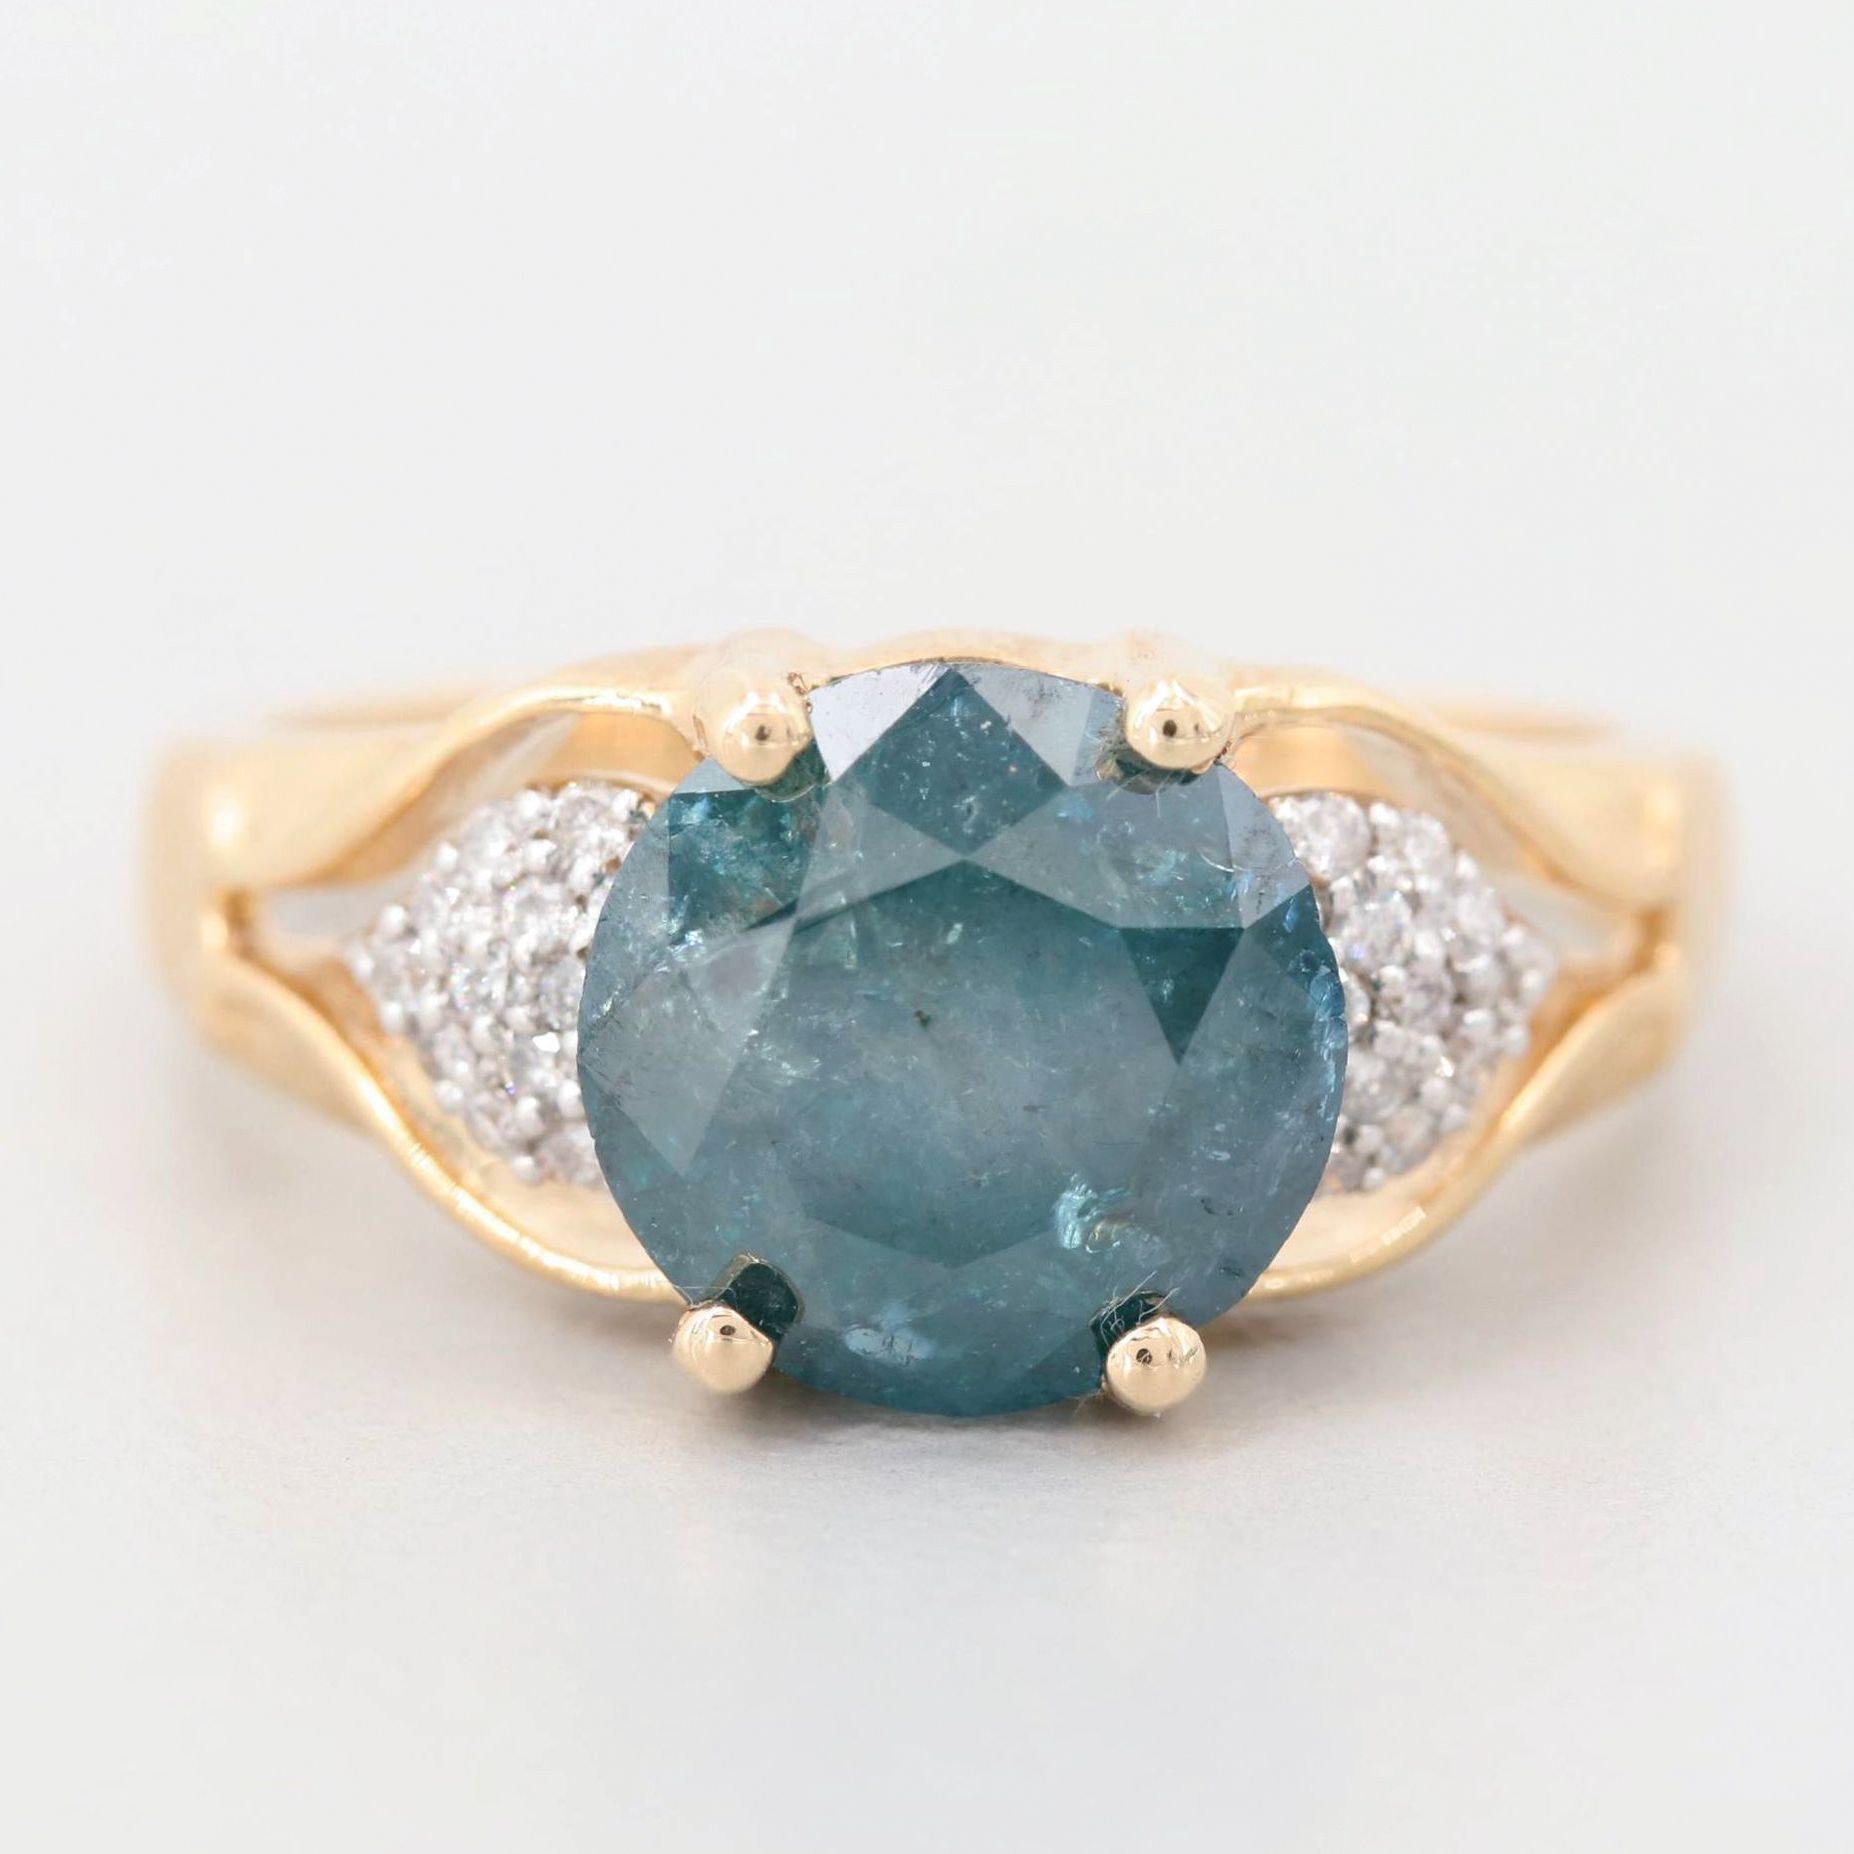 14K Yellow Gold 3.12 CTW Diamond Ring